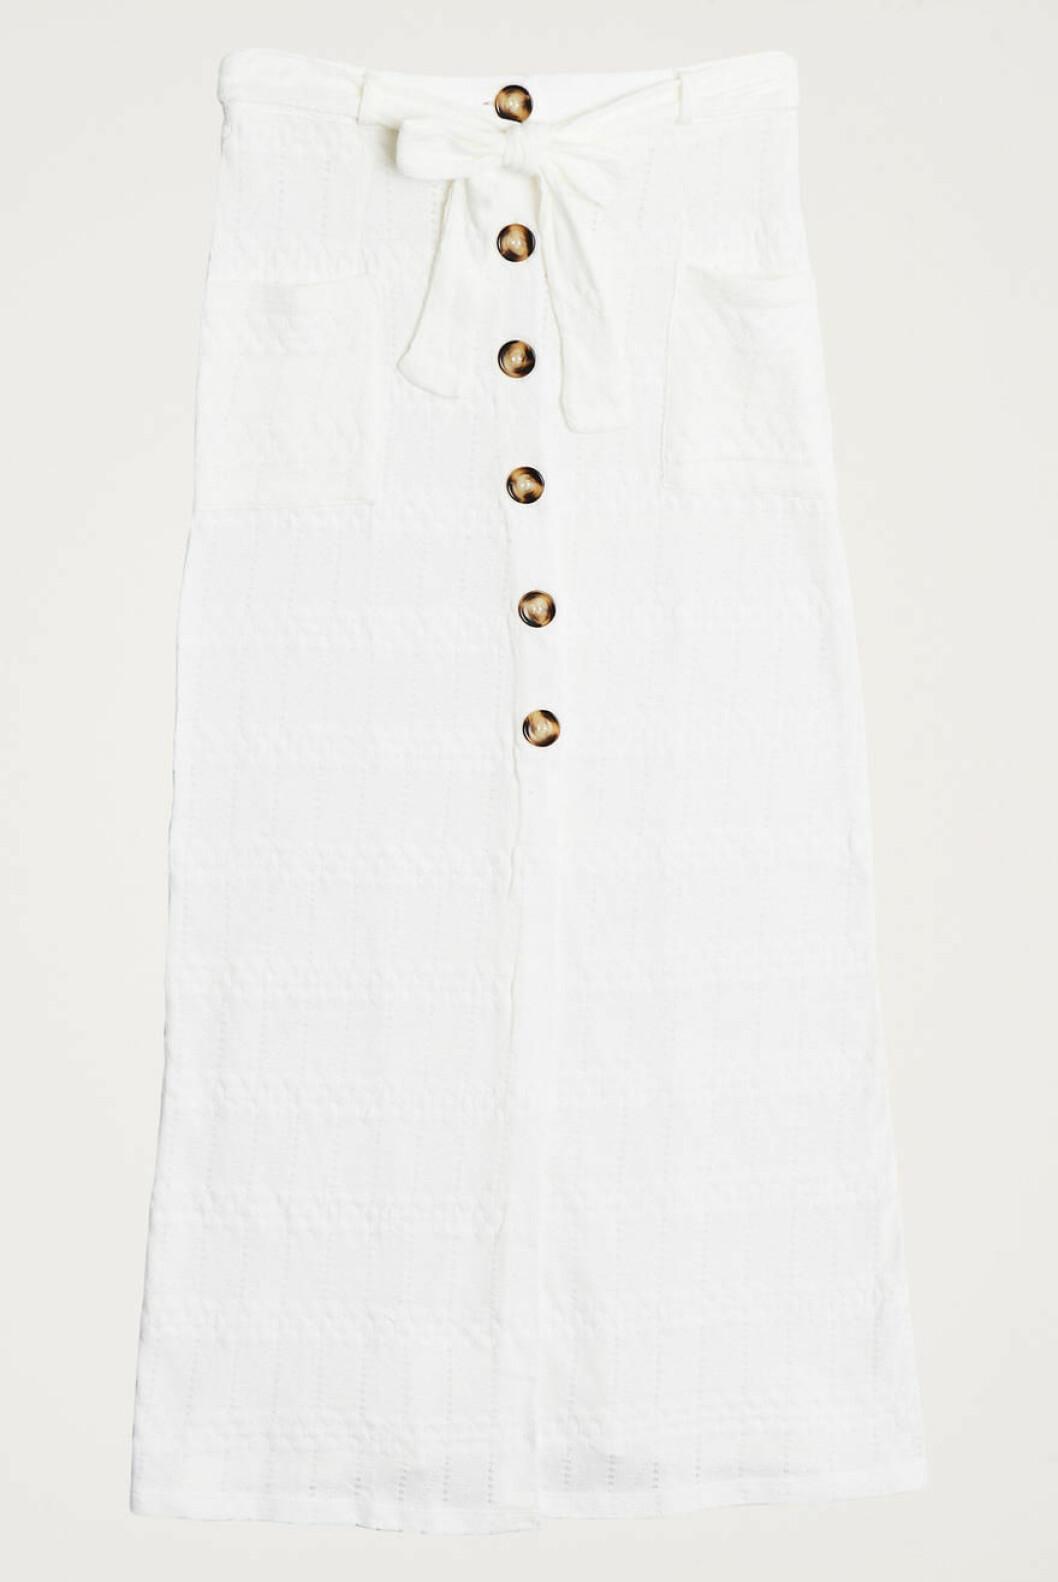 Vit kjol från Gina tricot